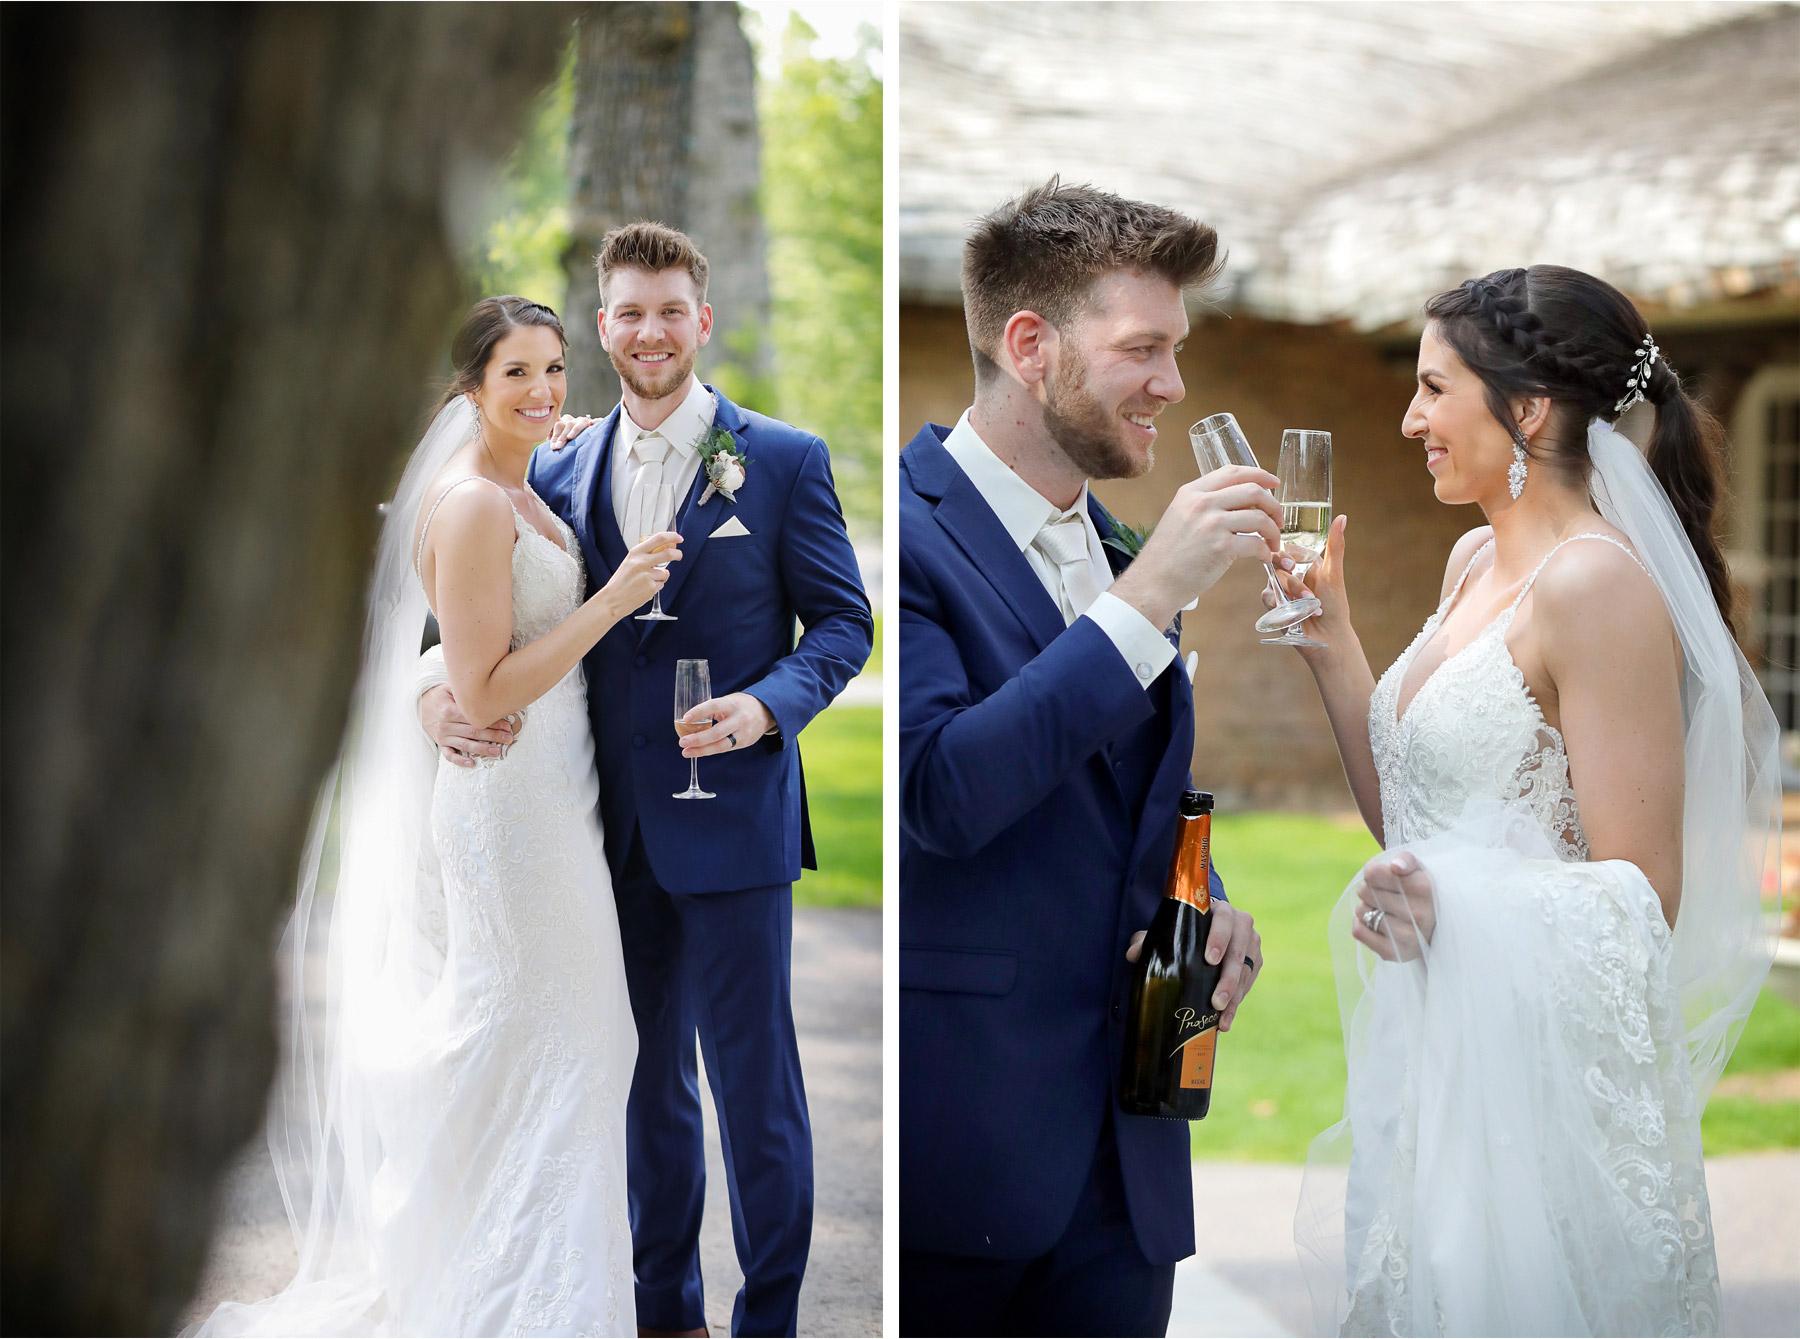 13-Minneapolis-Minnesota-Wedding-Andrew-Vick-Photography-Bavaria-Downs-Bride-Groom-Summer-Toast-Paige-and-Blake.jpg